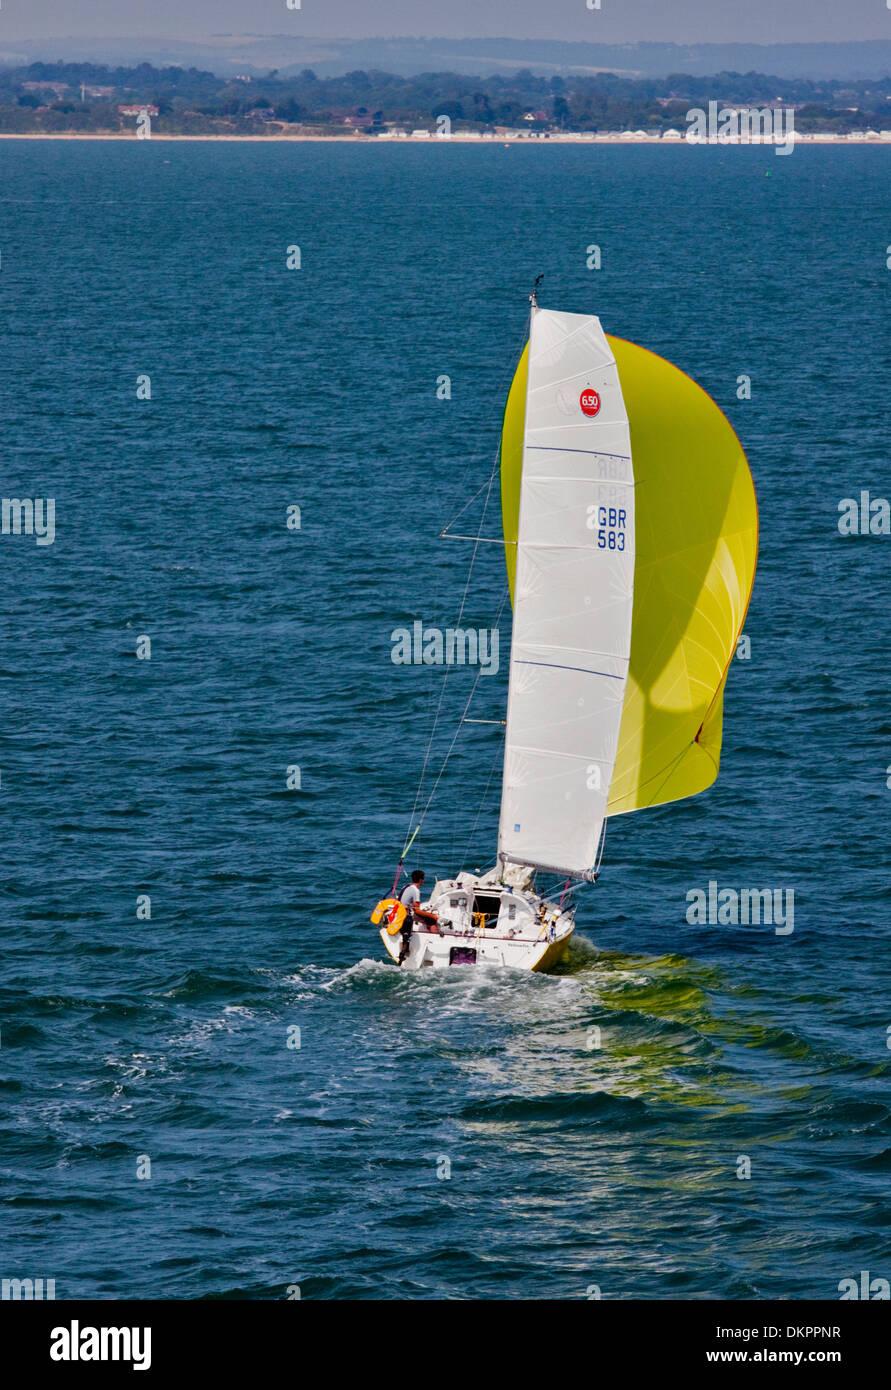 Man sailing Yacht sailing on Southampton Water, Hampshire, England - Stock Image